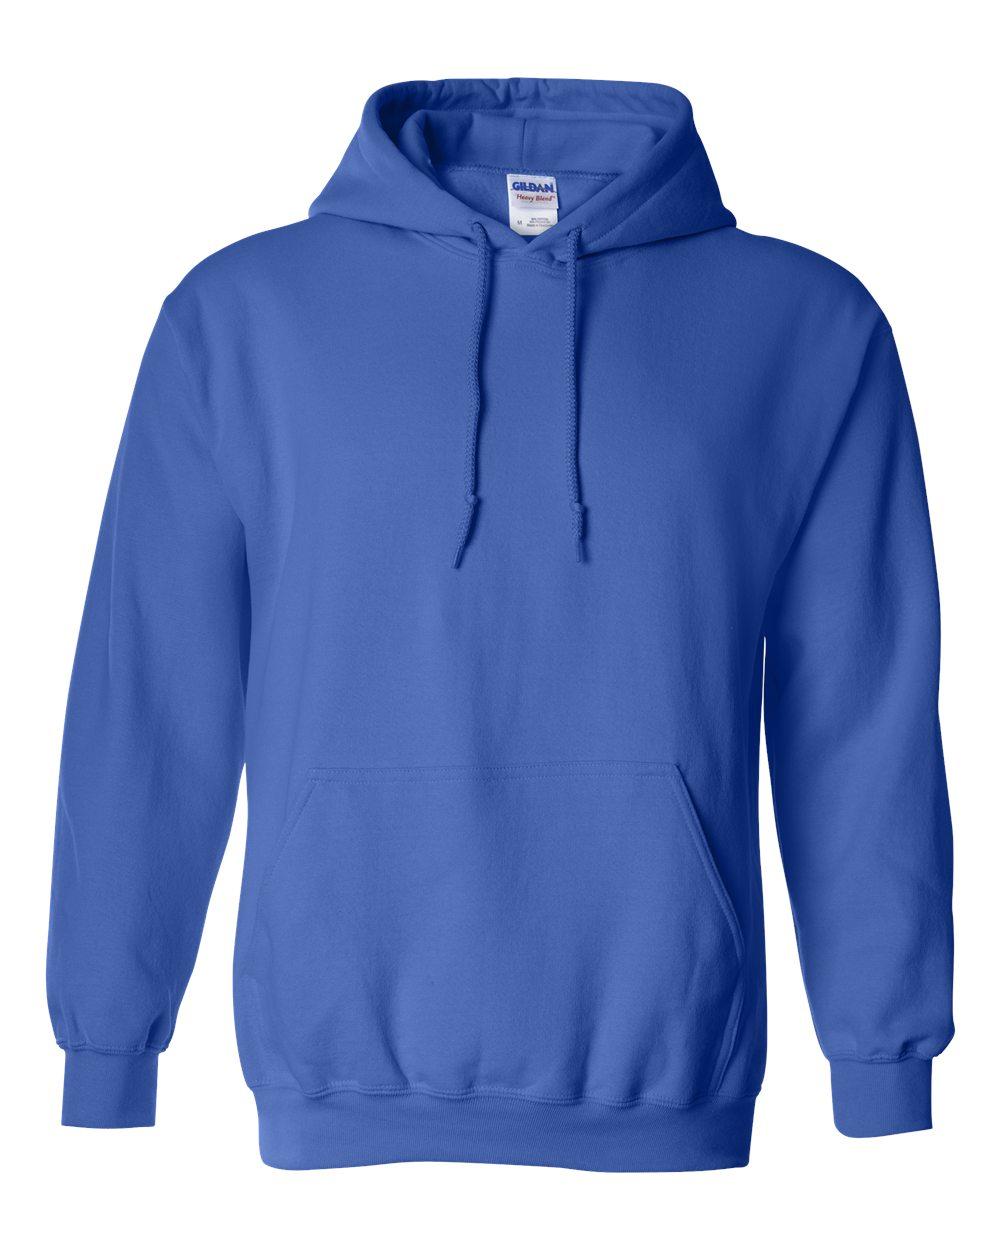 Sweatshirts/Hoodies - US Availability